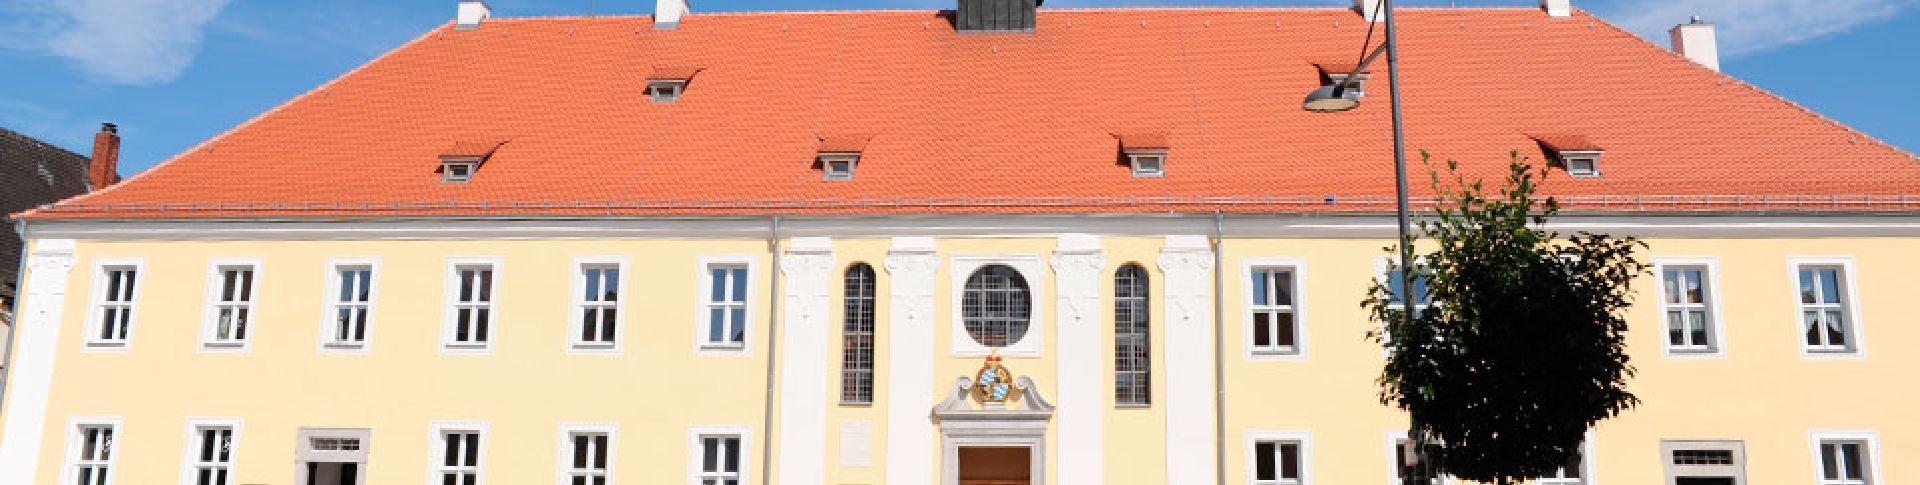 Spital zu Freystadt